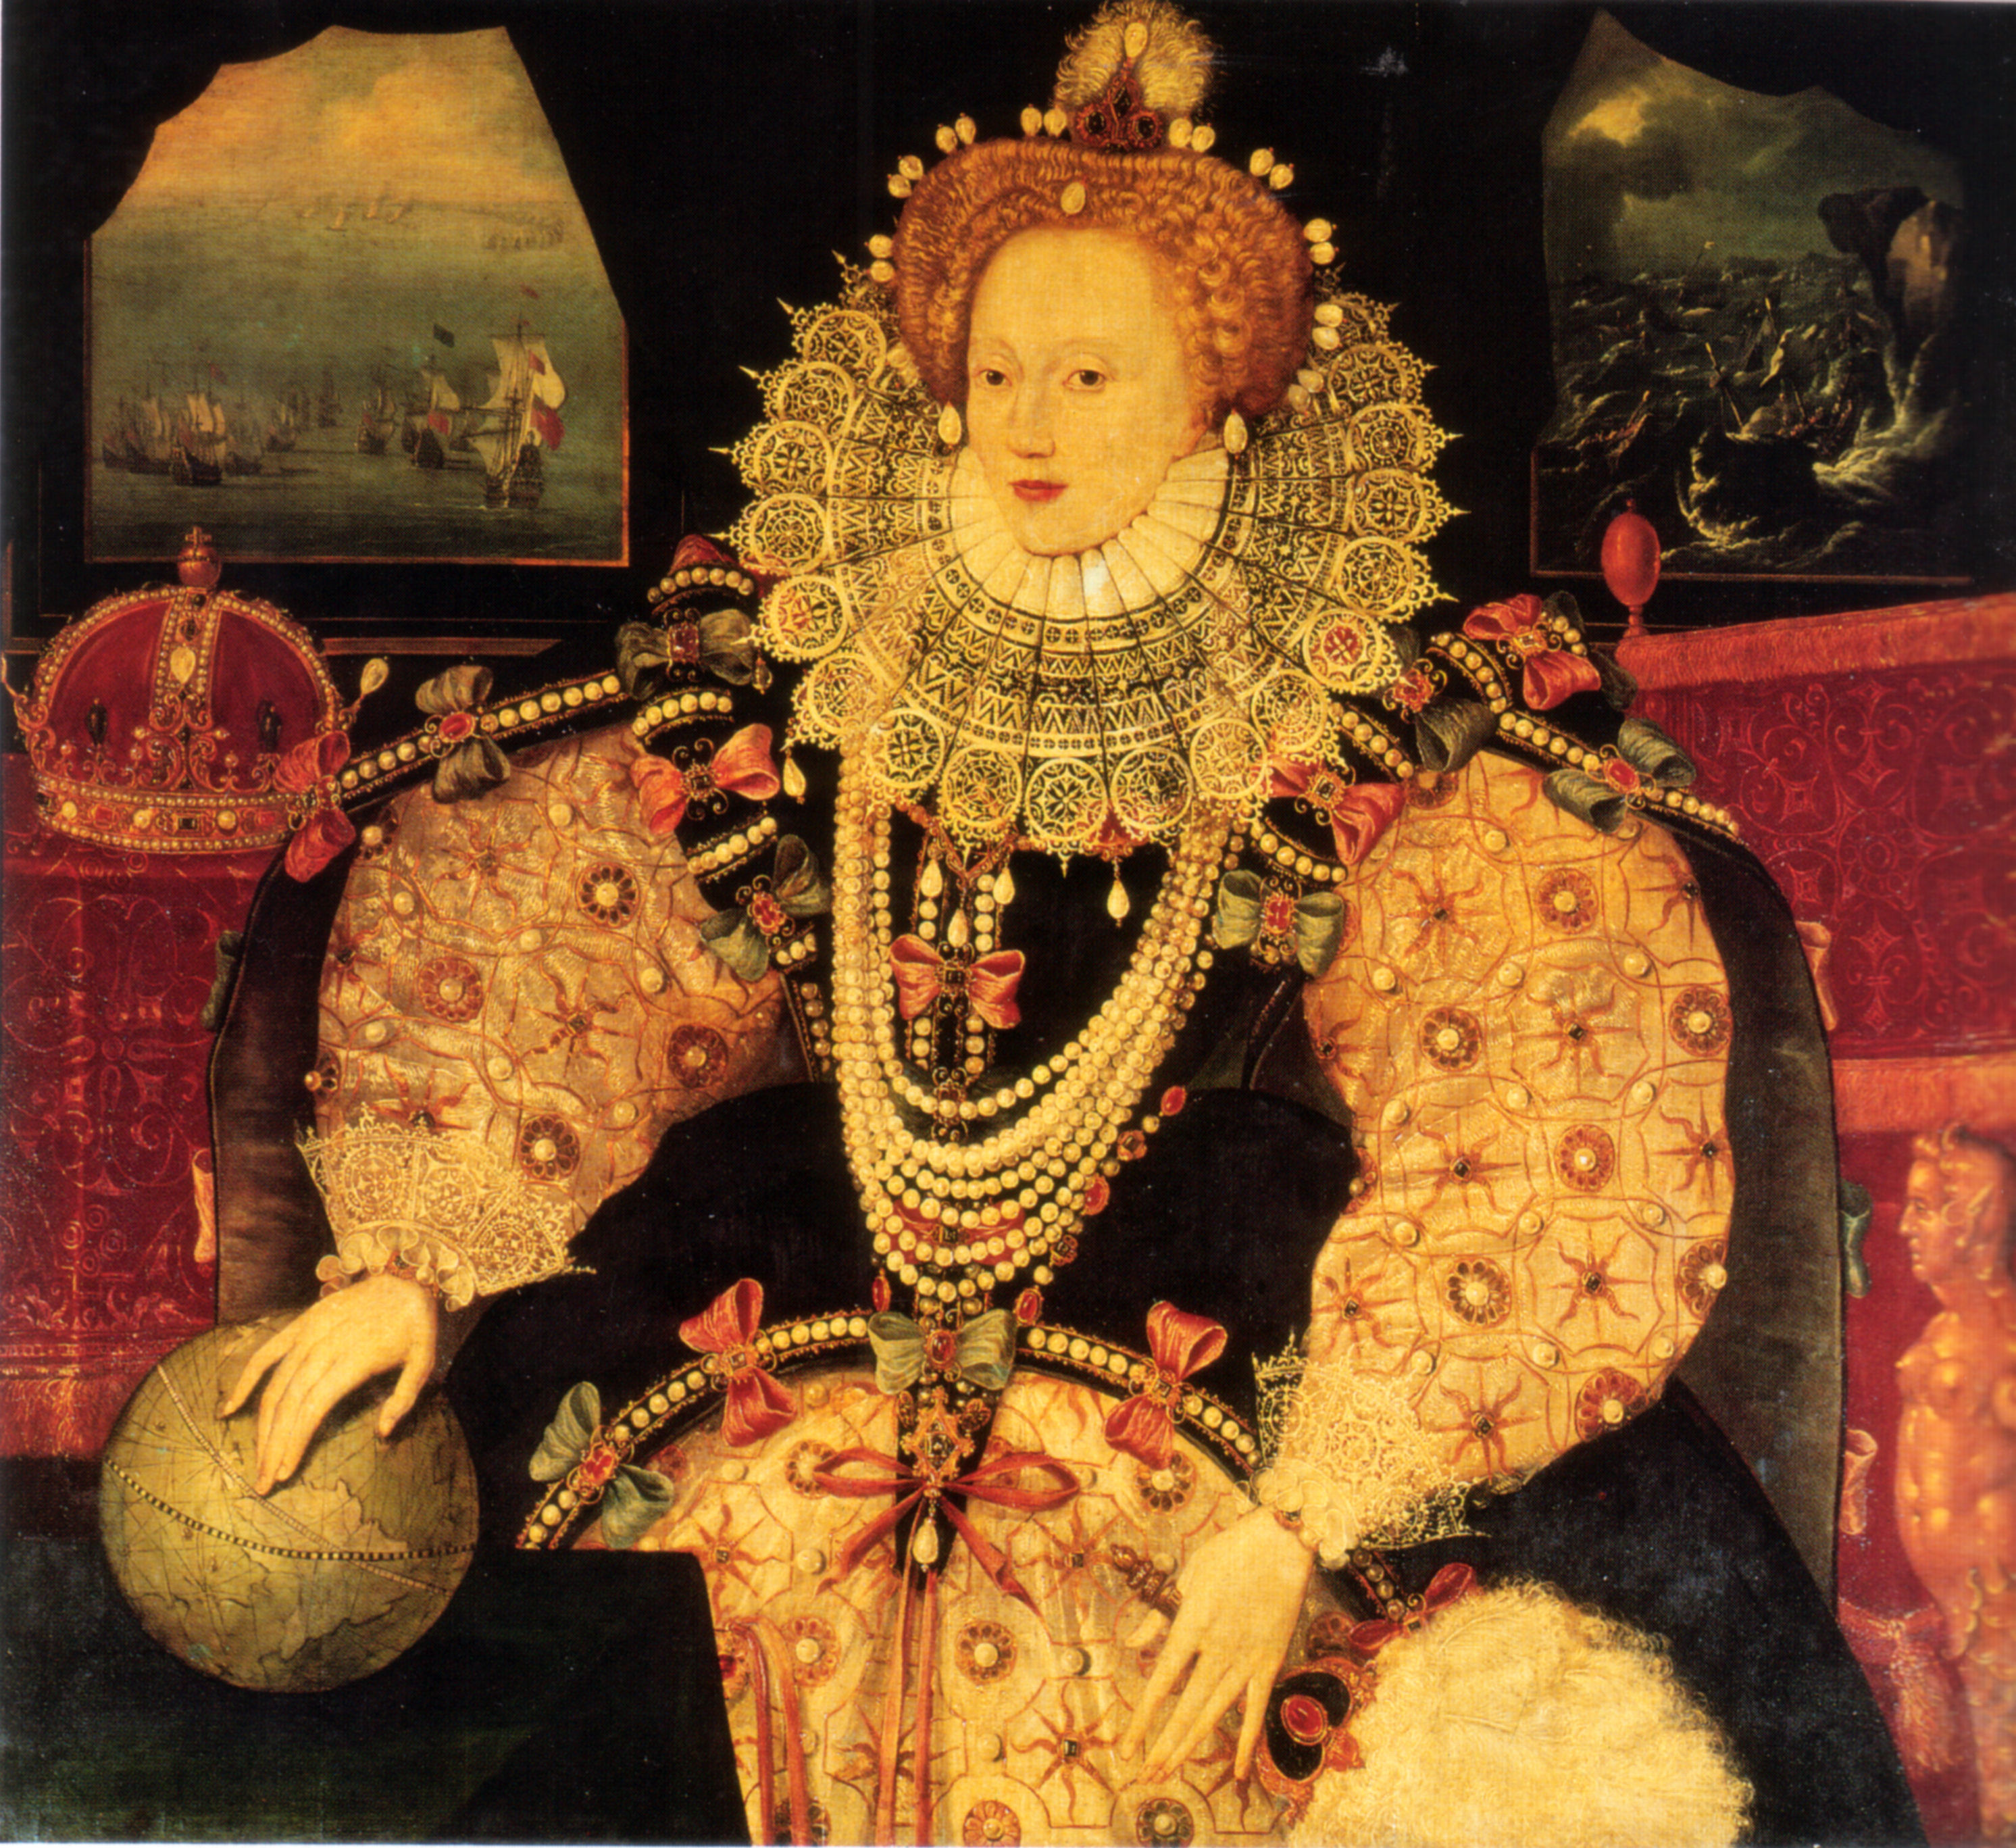 Analysis of queen elizabeth armada portrait